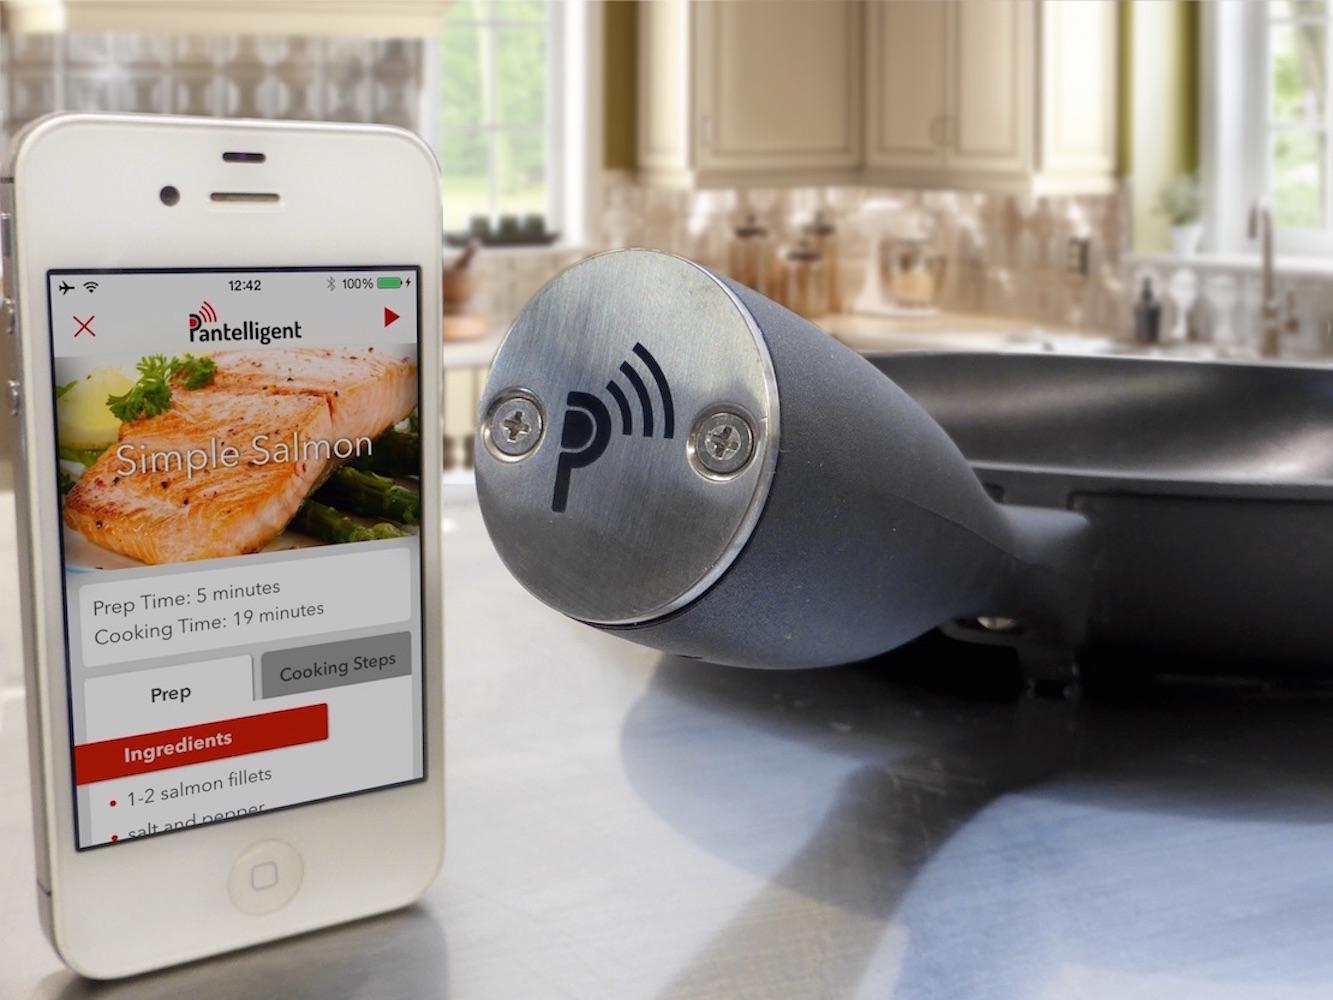 Pantelligent – Smart Frying Pan